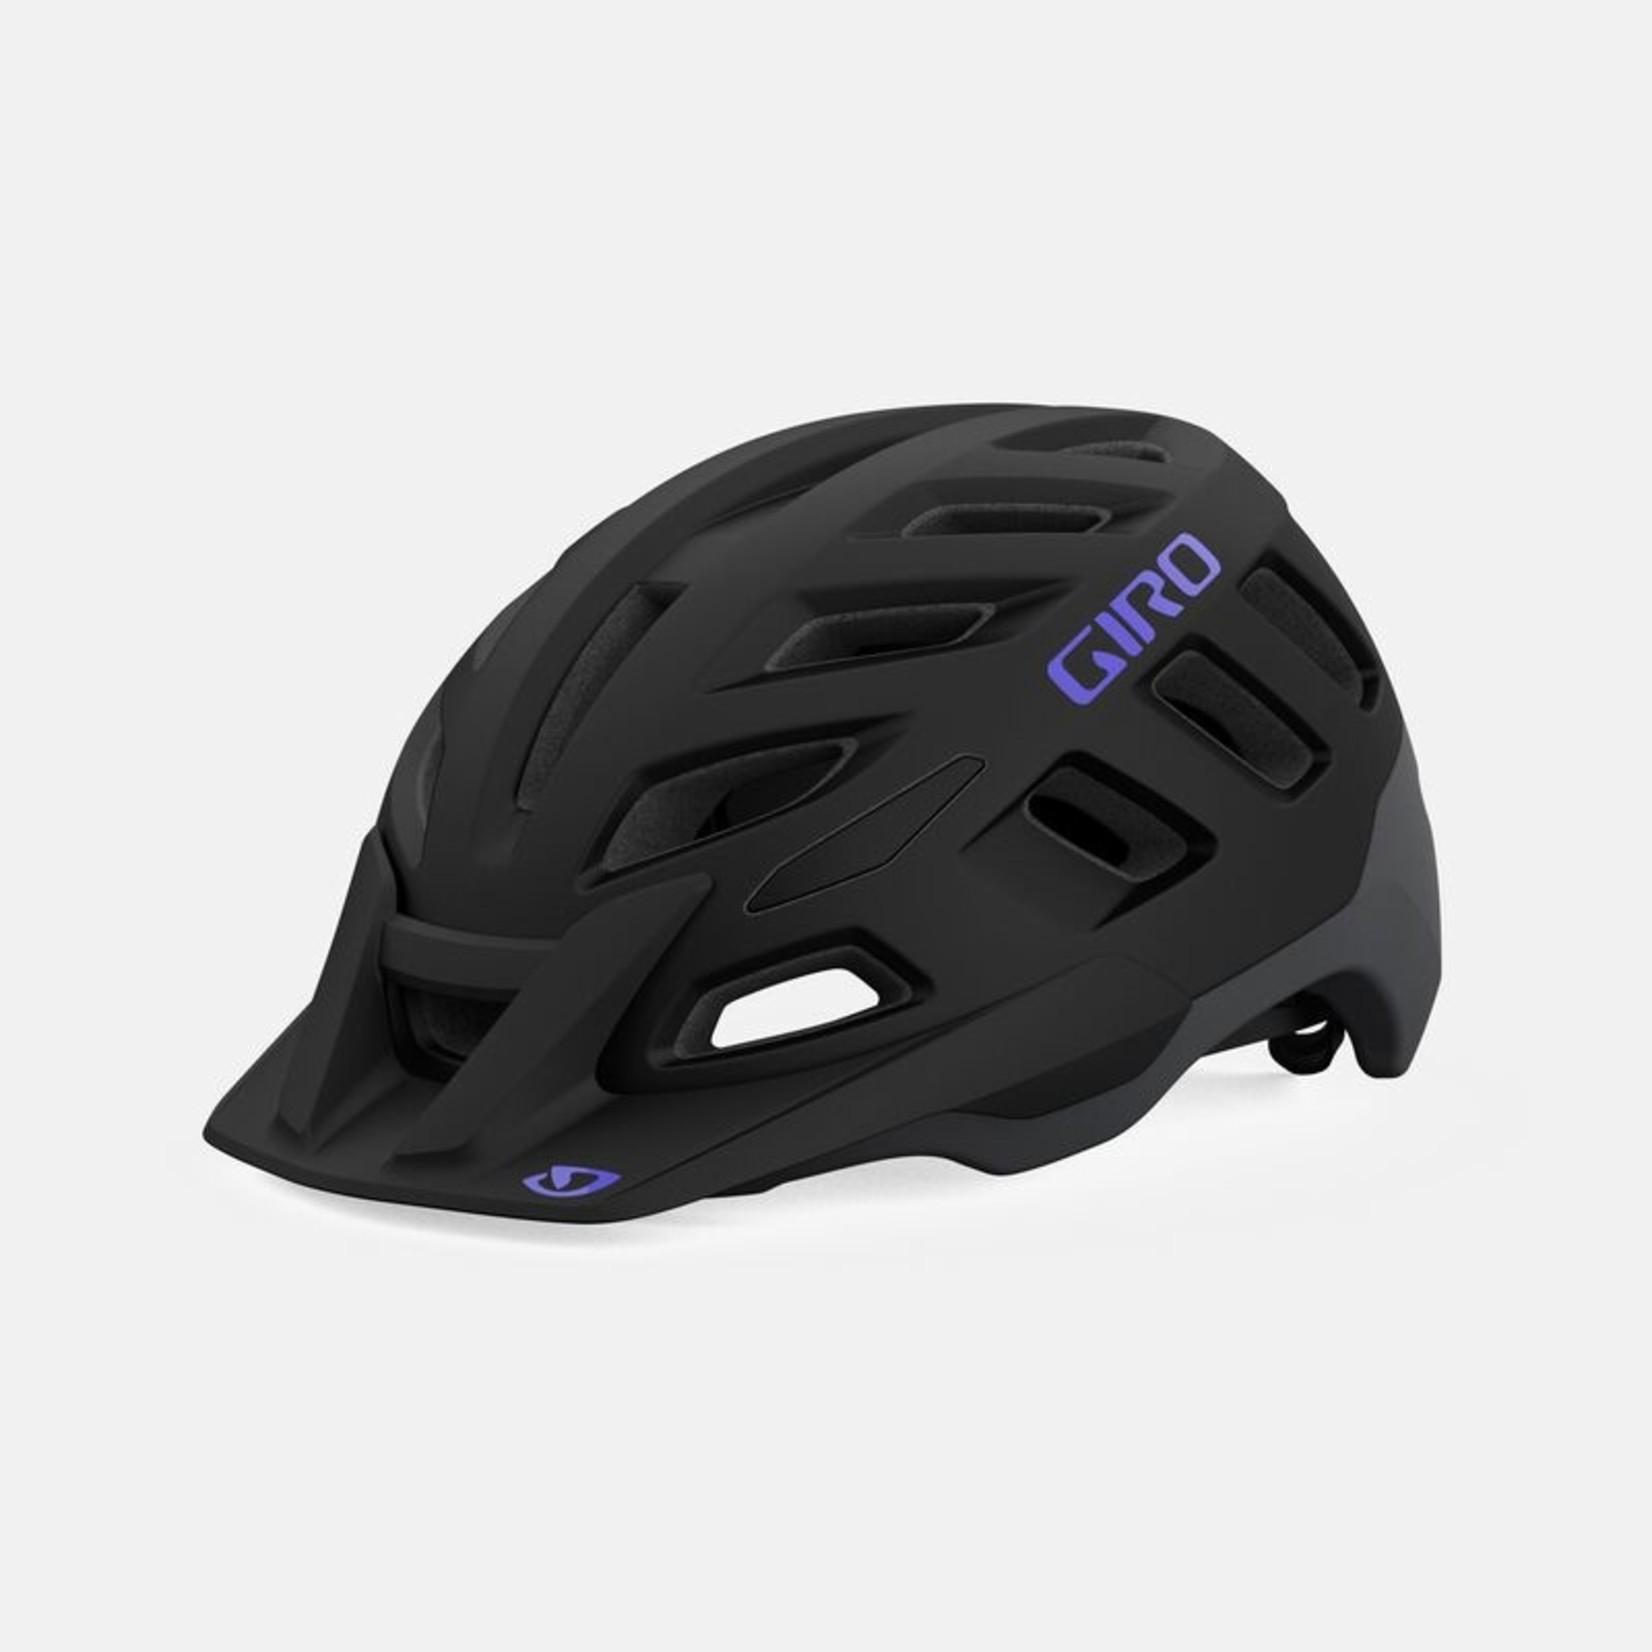 Giro Giro, Radix Mips, Mat Black/Electric Purple, Small